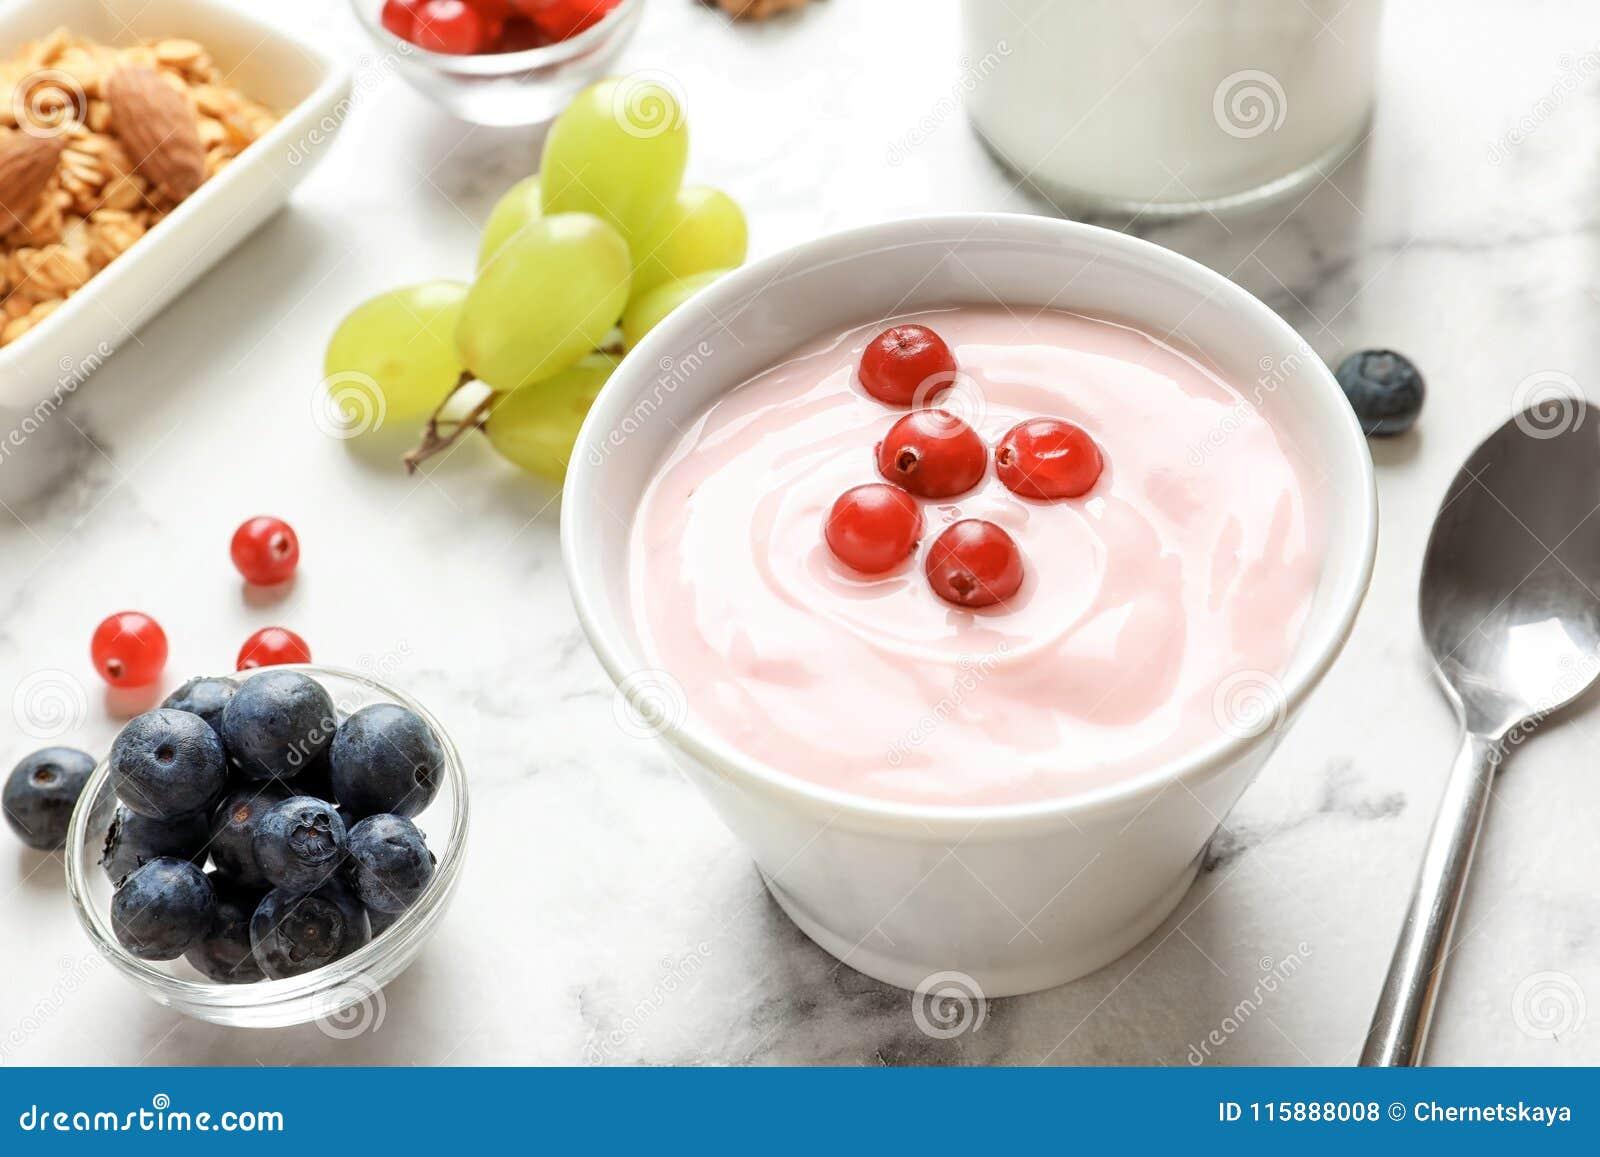 Bowl with tasty yogurt and berries